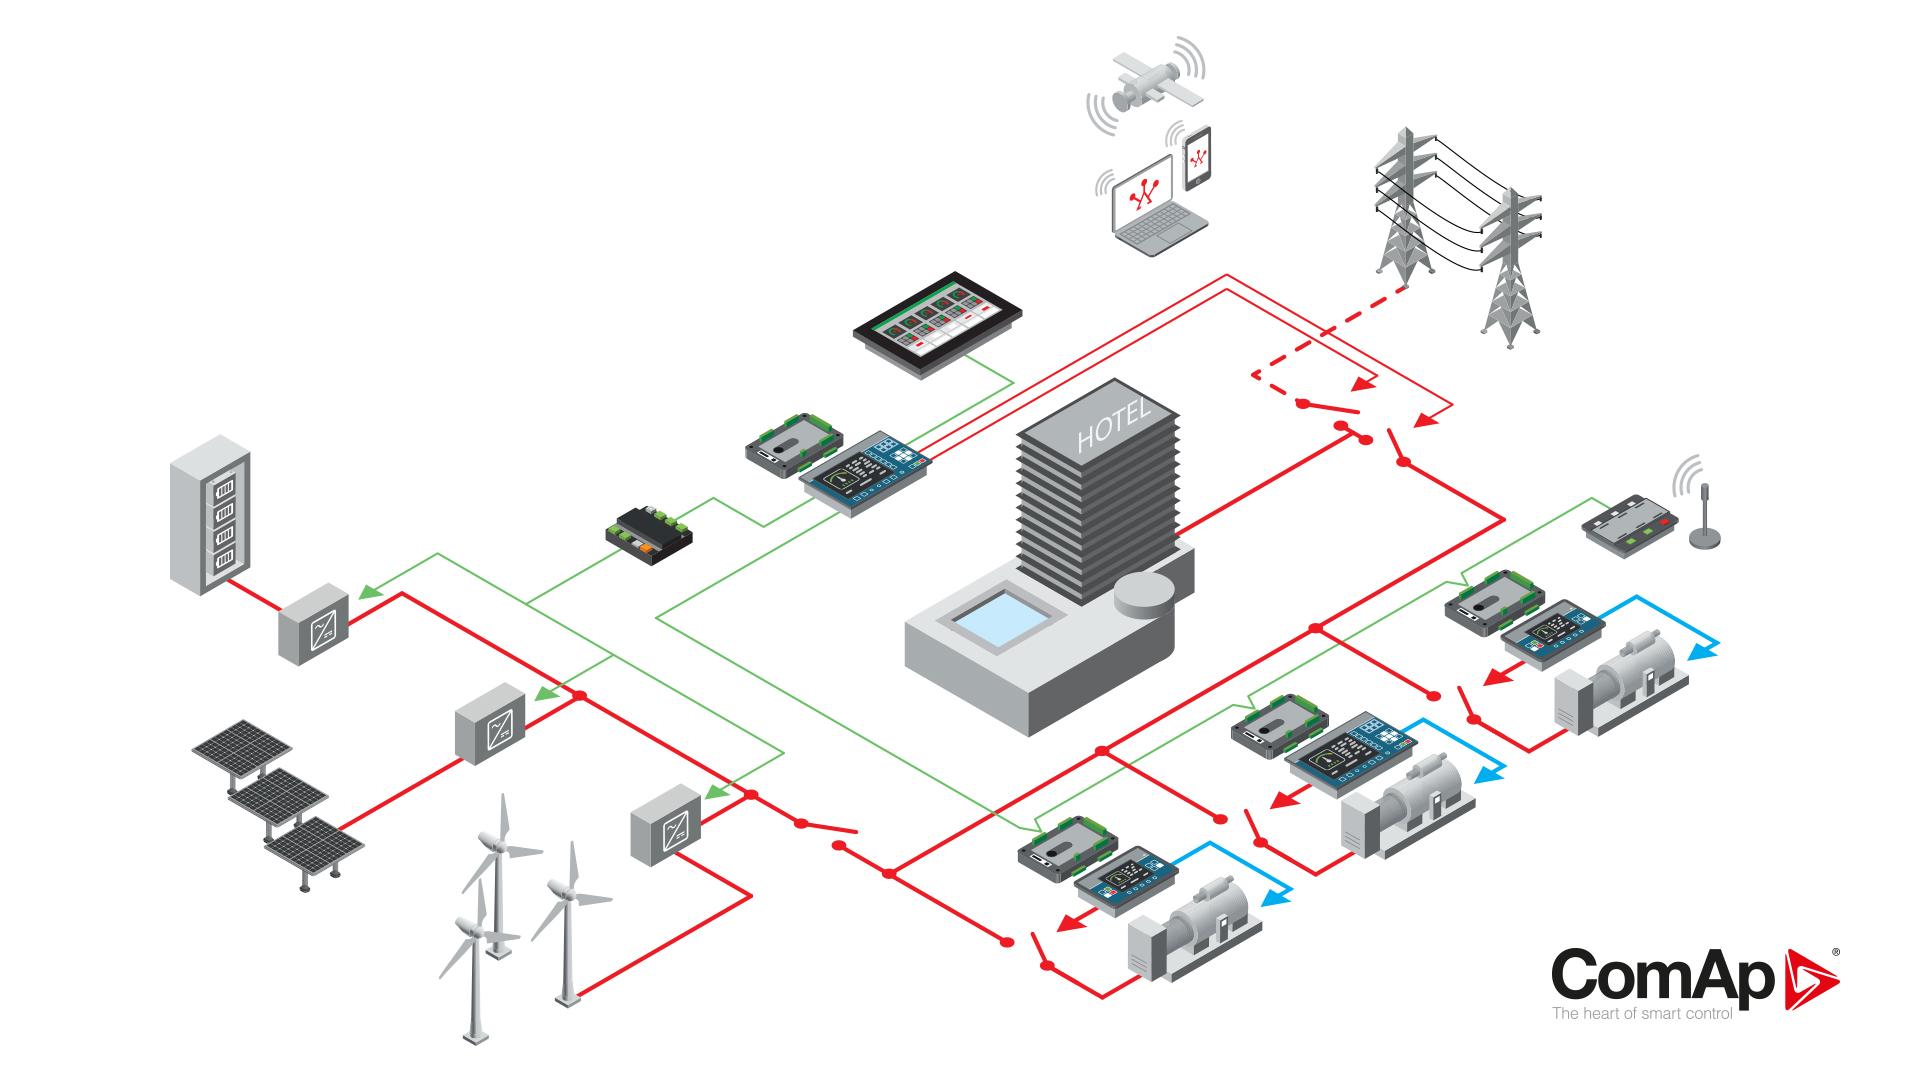 ComAp's hybrid microgrid solution